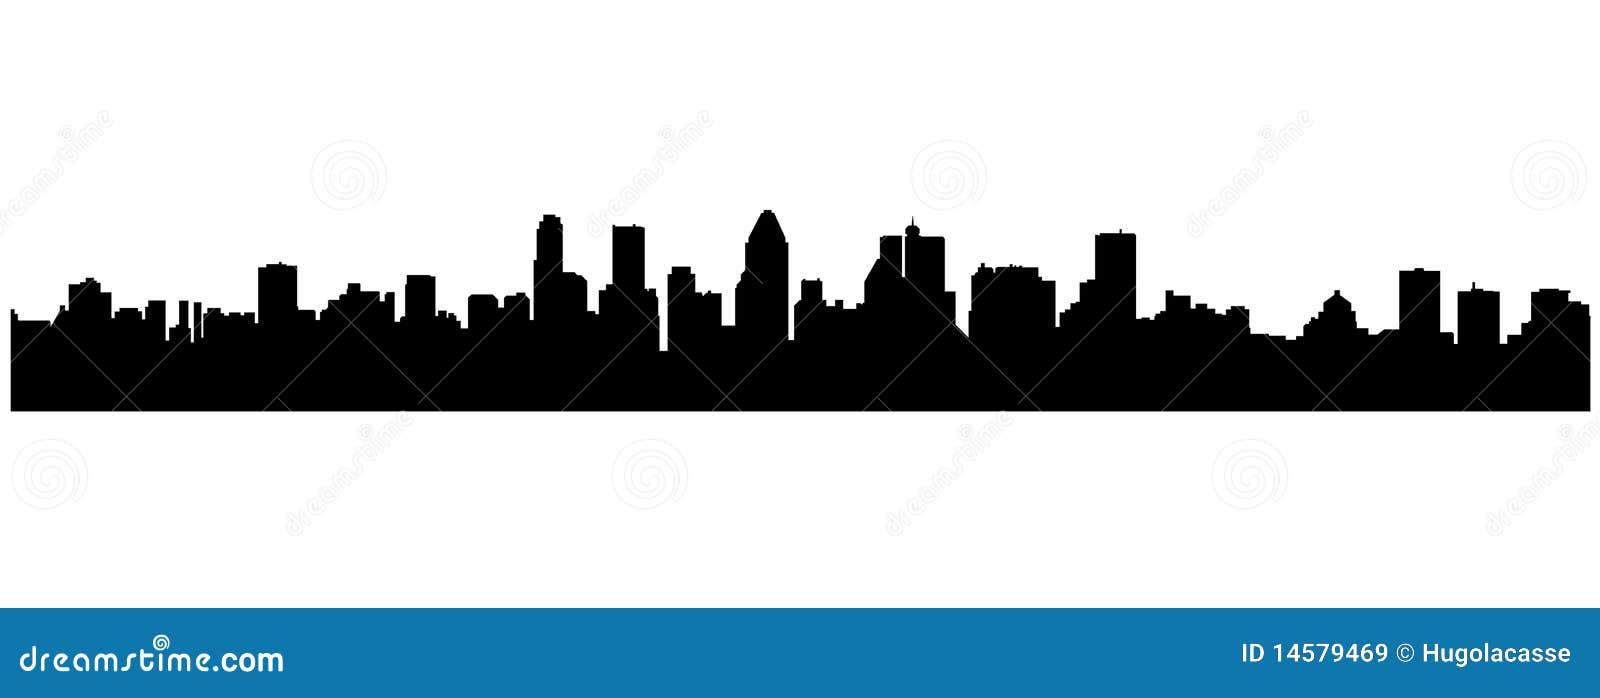 cityscape vector icons stock vector illustration of geometry 42805963 rh dreamstime com cityscape vector download cityscape vector ai